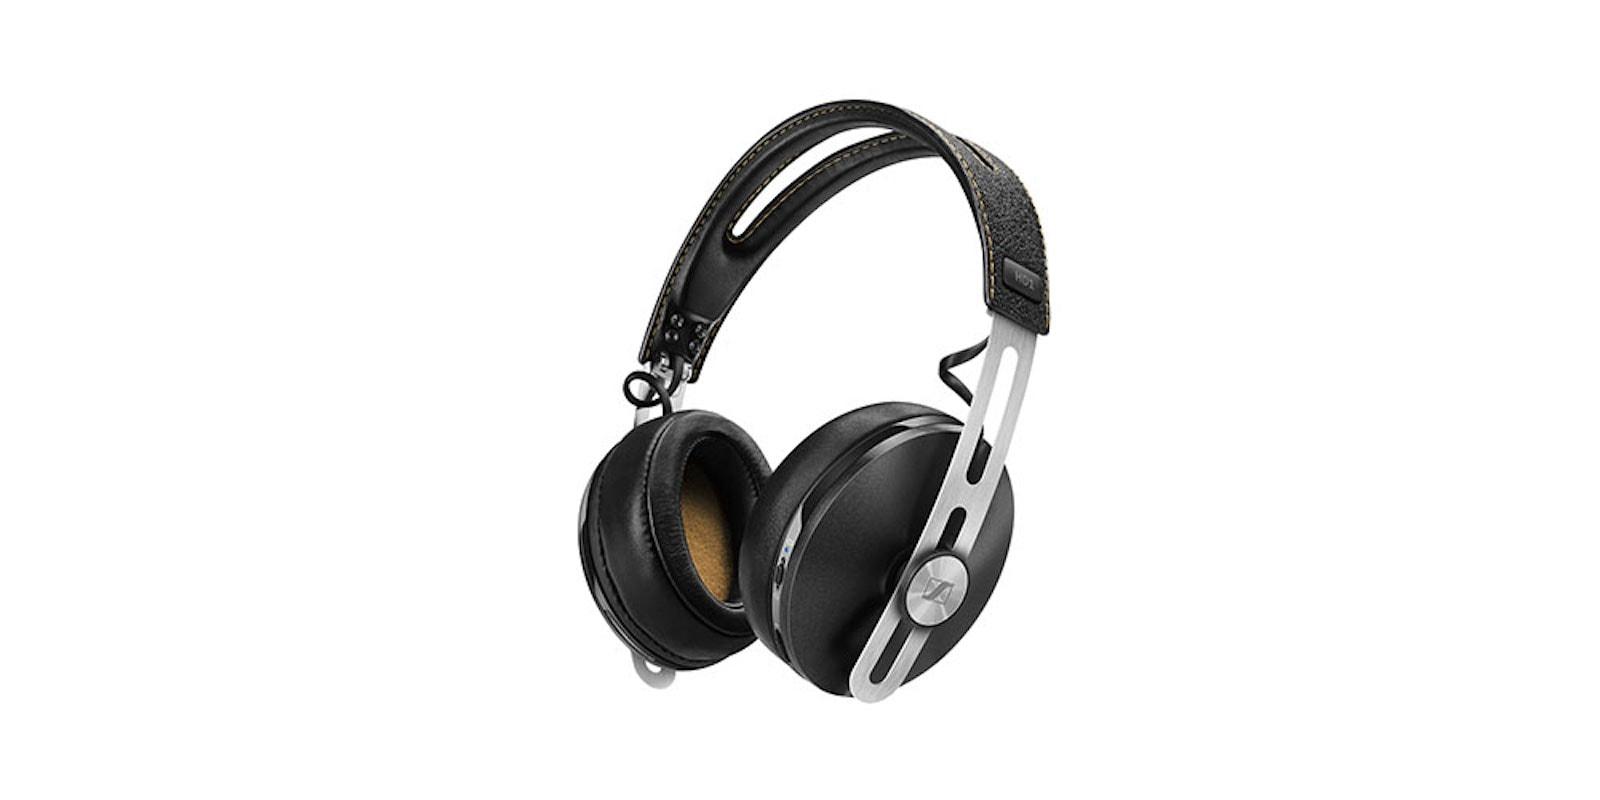 Sennheiser Momentum Wireless Active Noise Cancelling Headphones